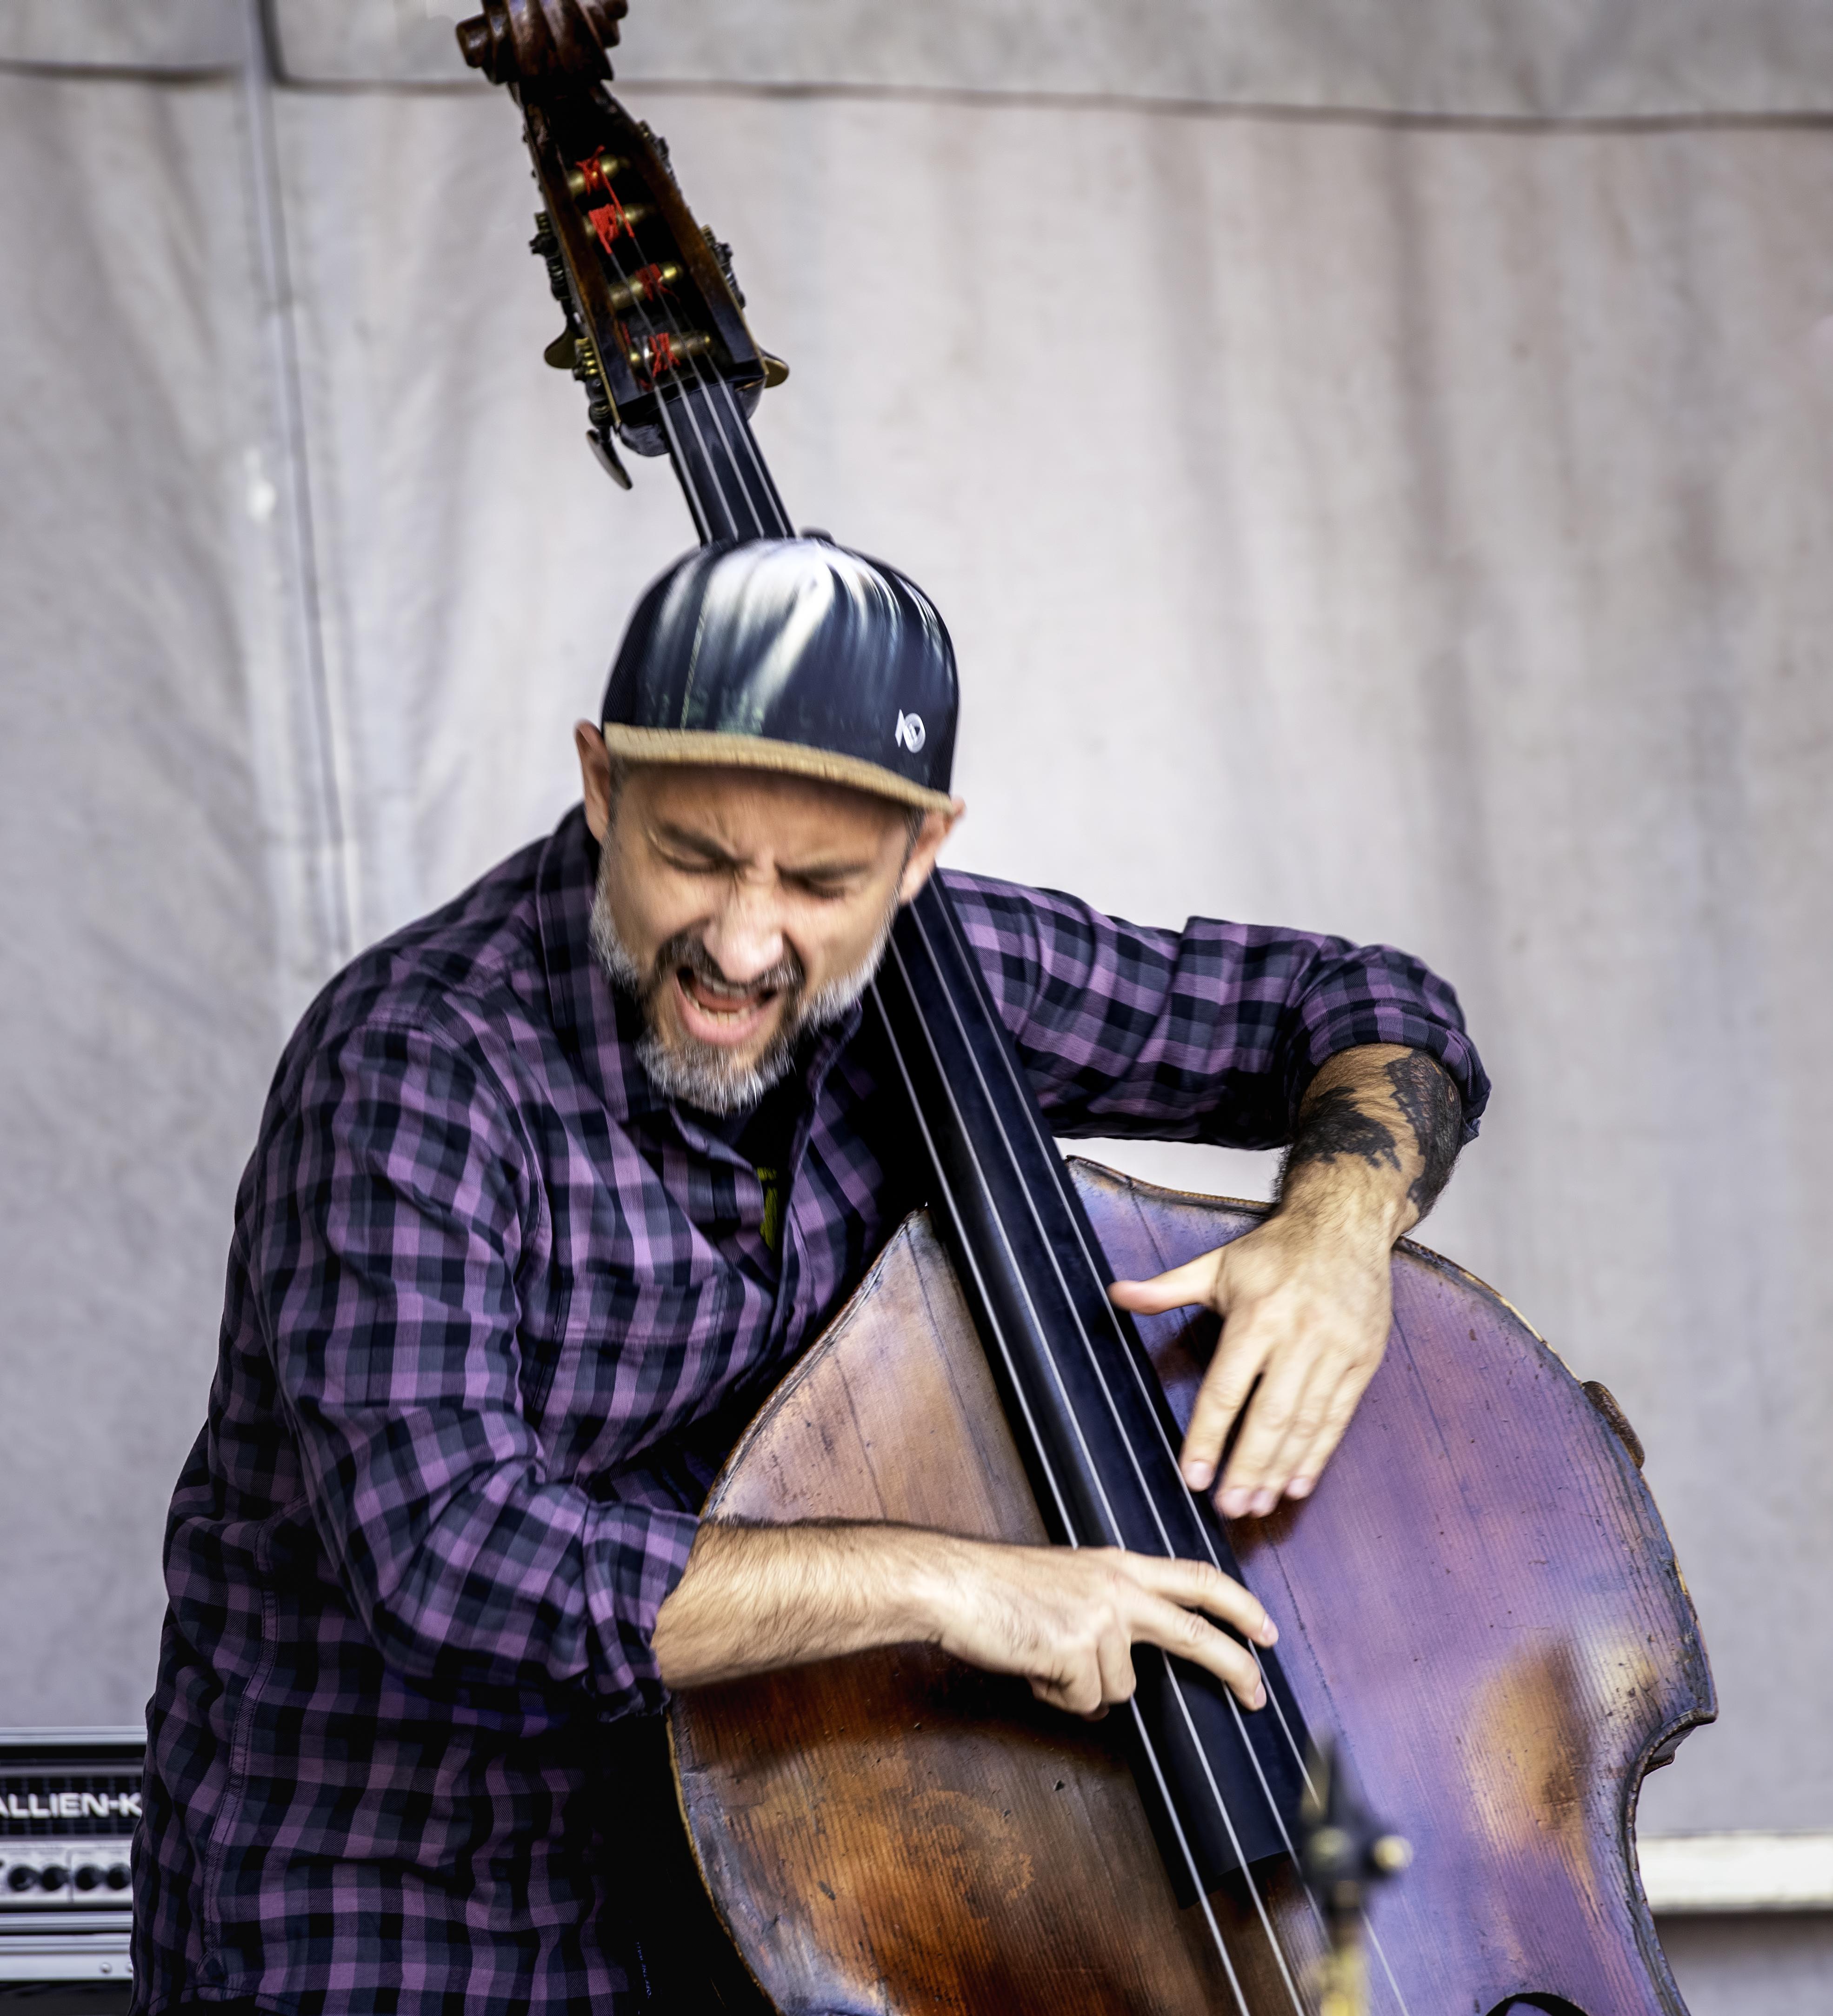 Stéphane Diamantakiou with the Eyevin Trio at the Guelph Jazz Festival 2019